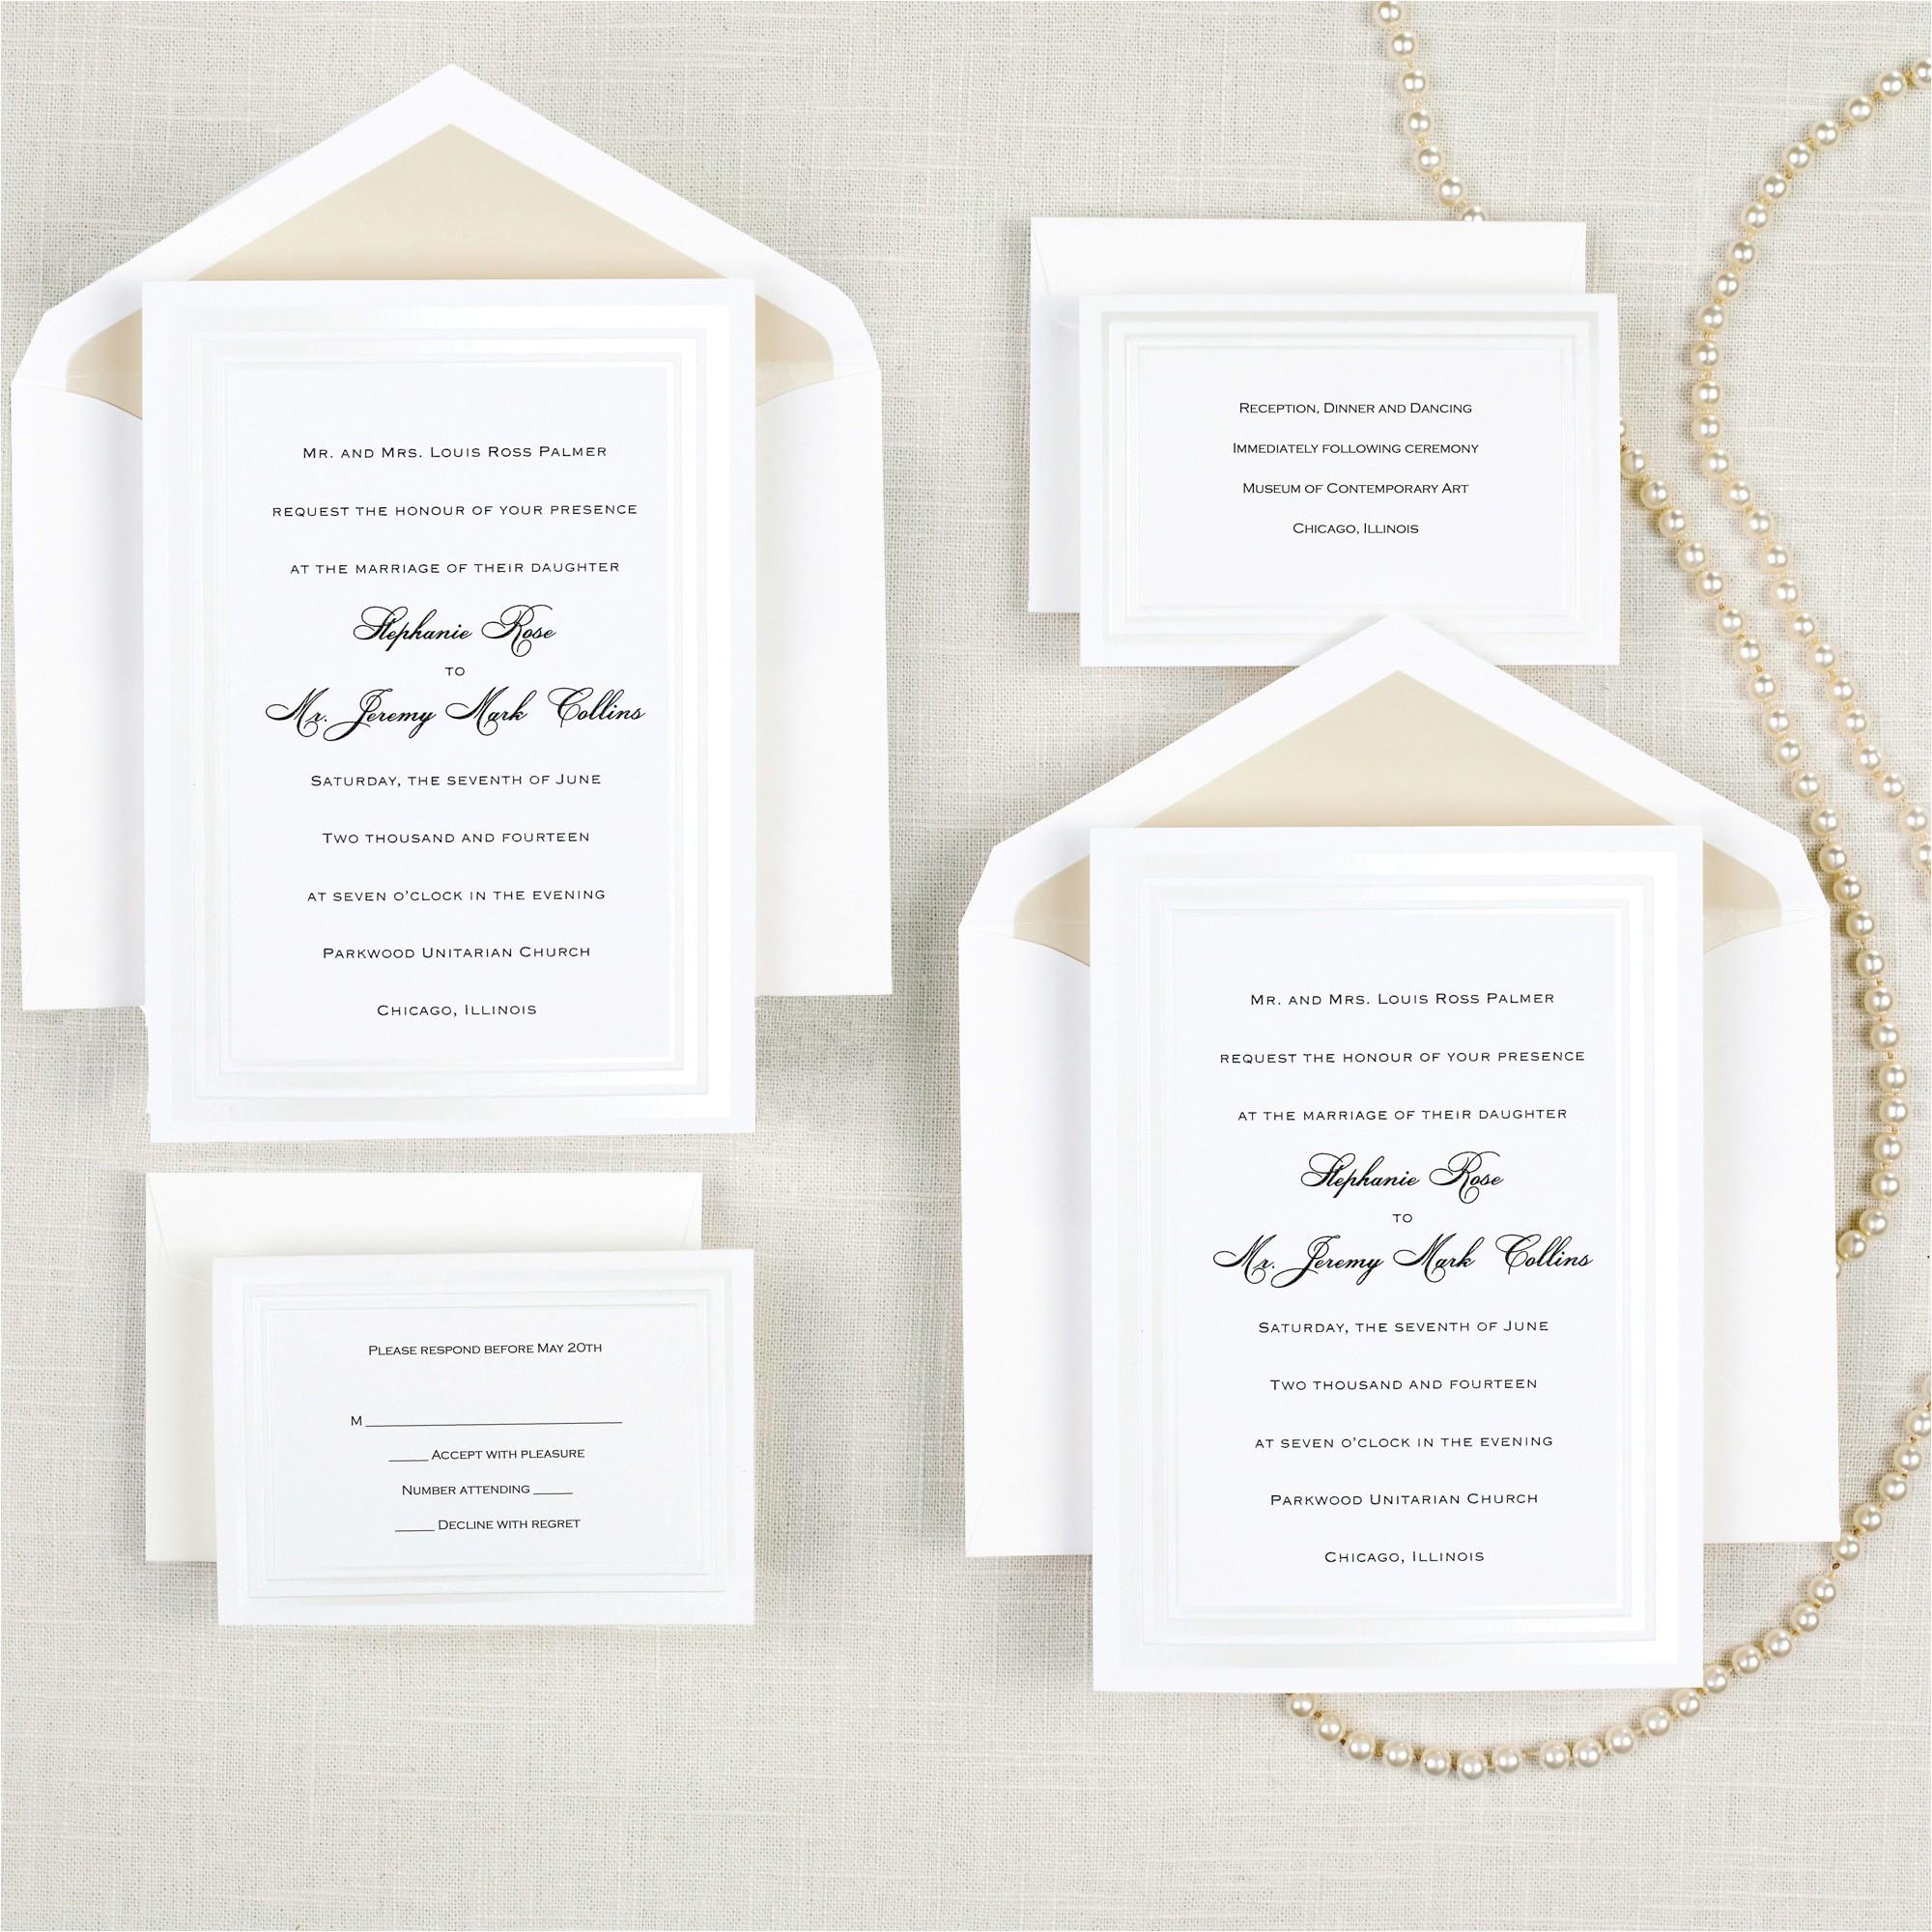 designs cheap wedding invitation sets online as well as cheap